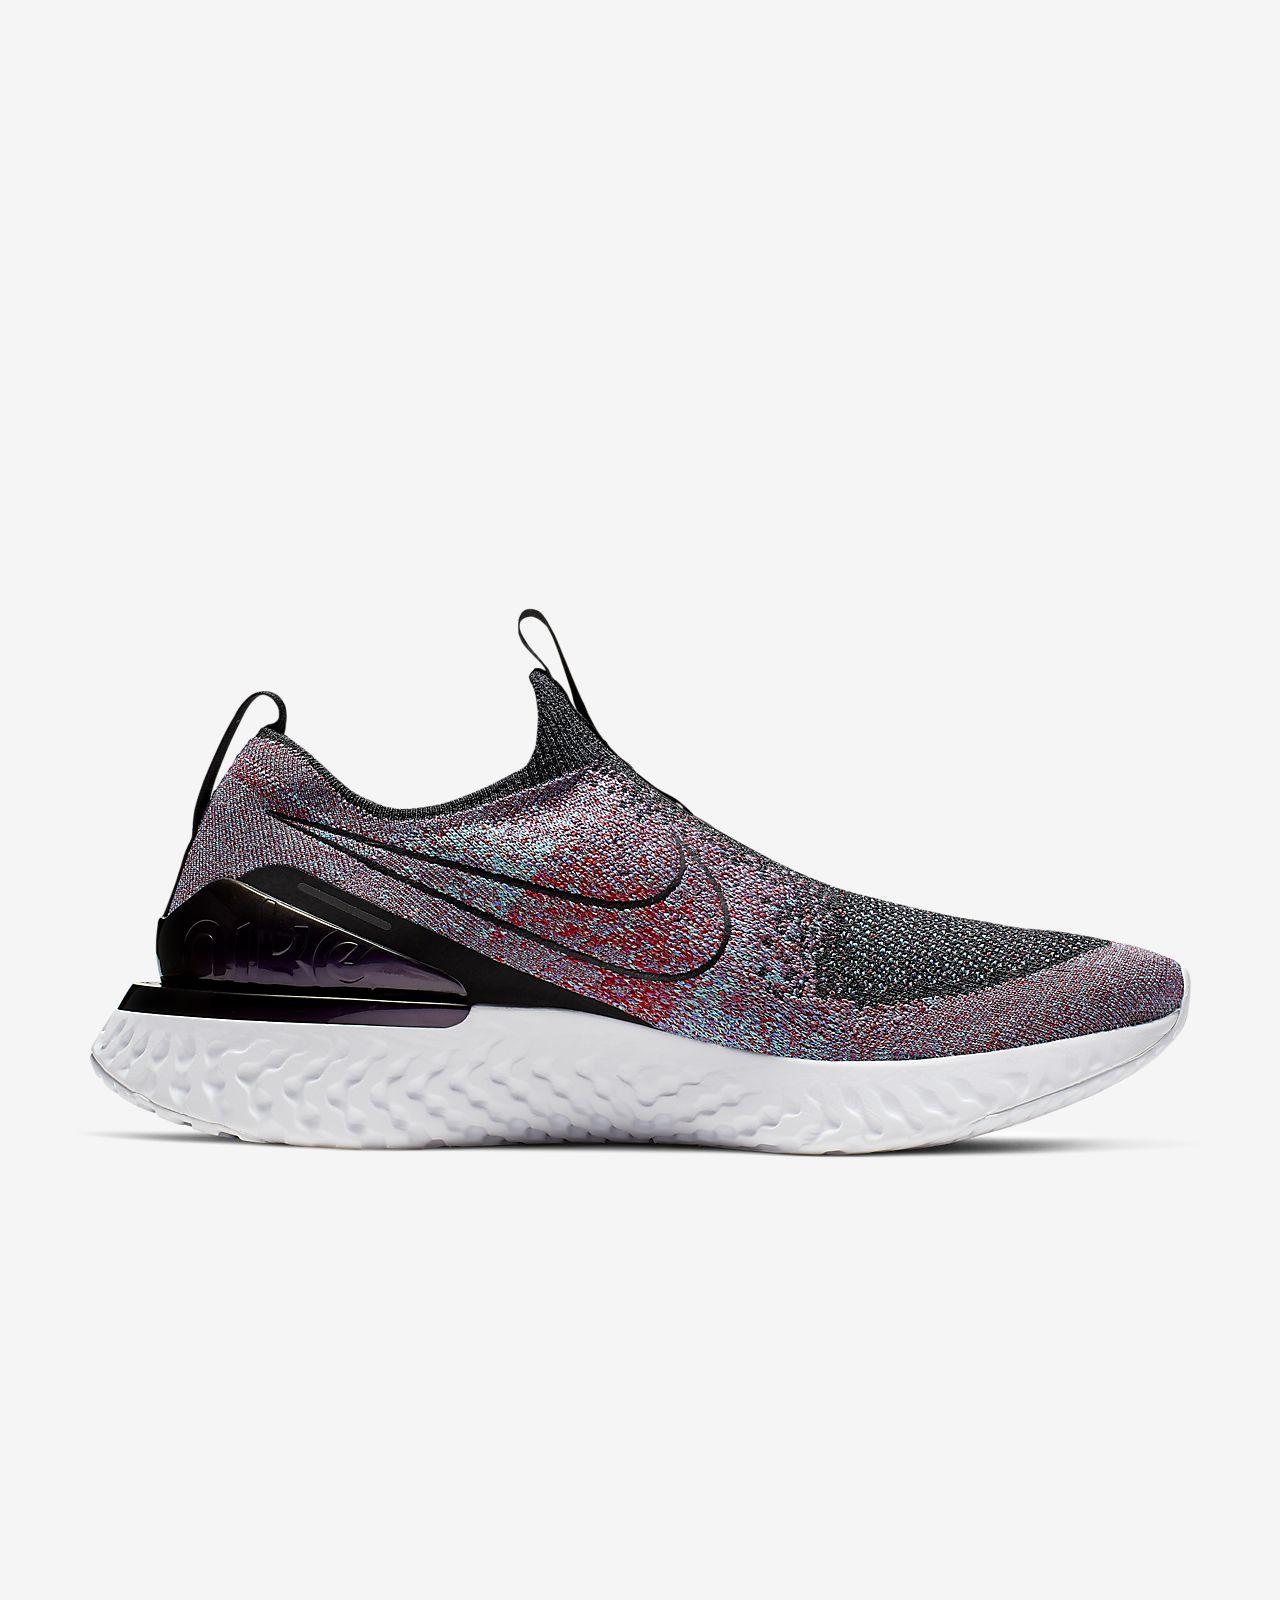 buy popular 91f82 681b9 ... Nike Epic Phantom React Flyknit Men s Running Shoe